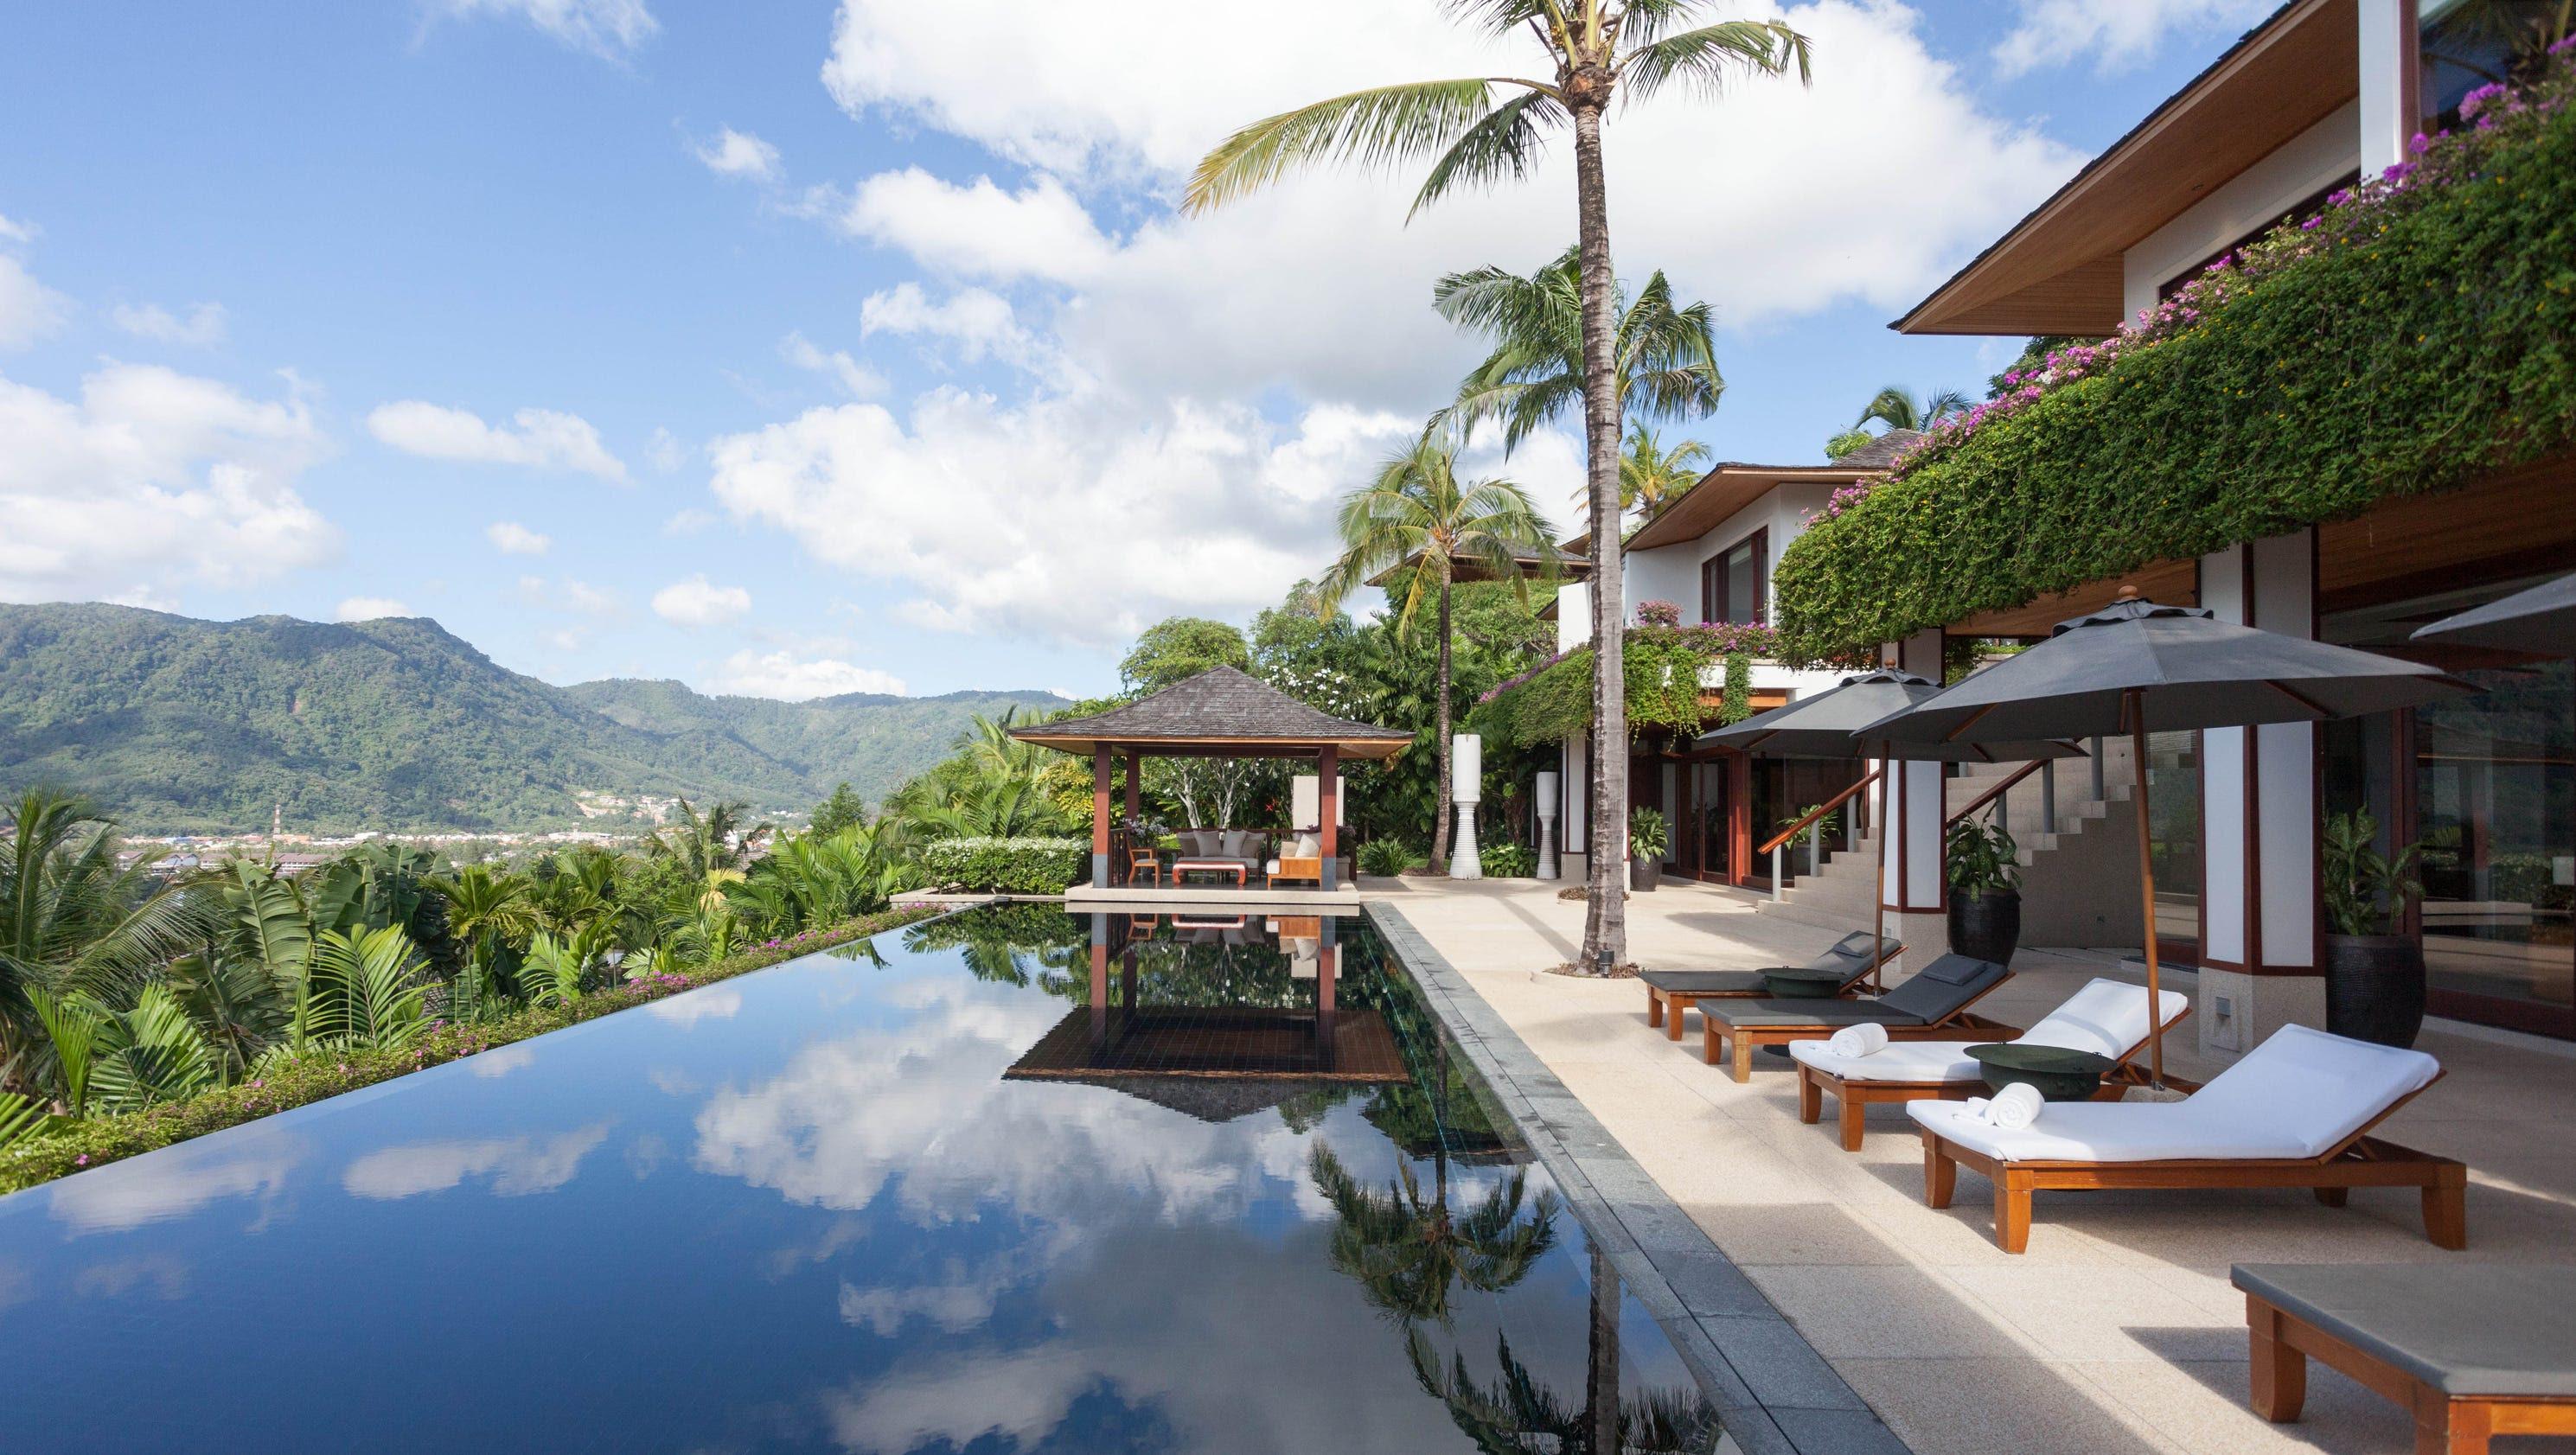 Photo tour Stunning luxury resorts in Phuket Thailand